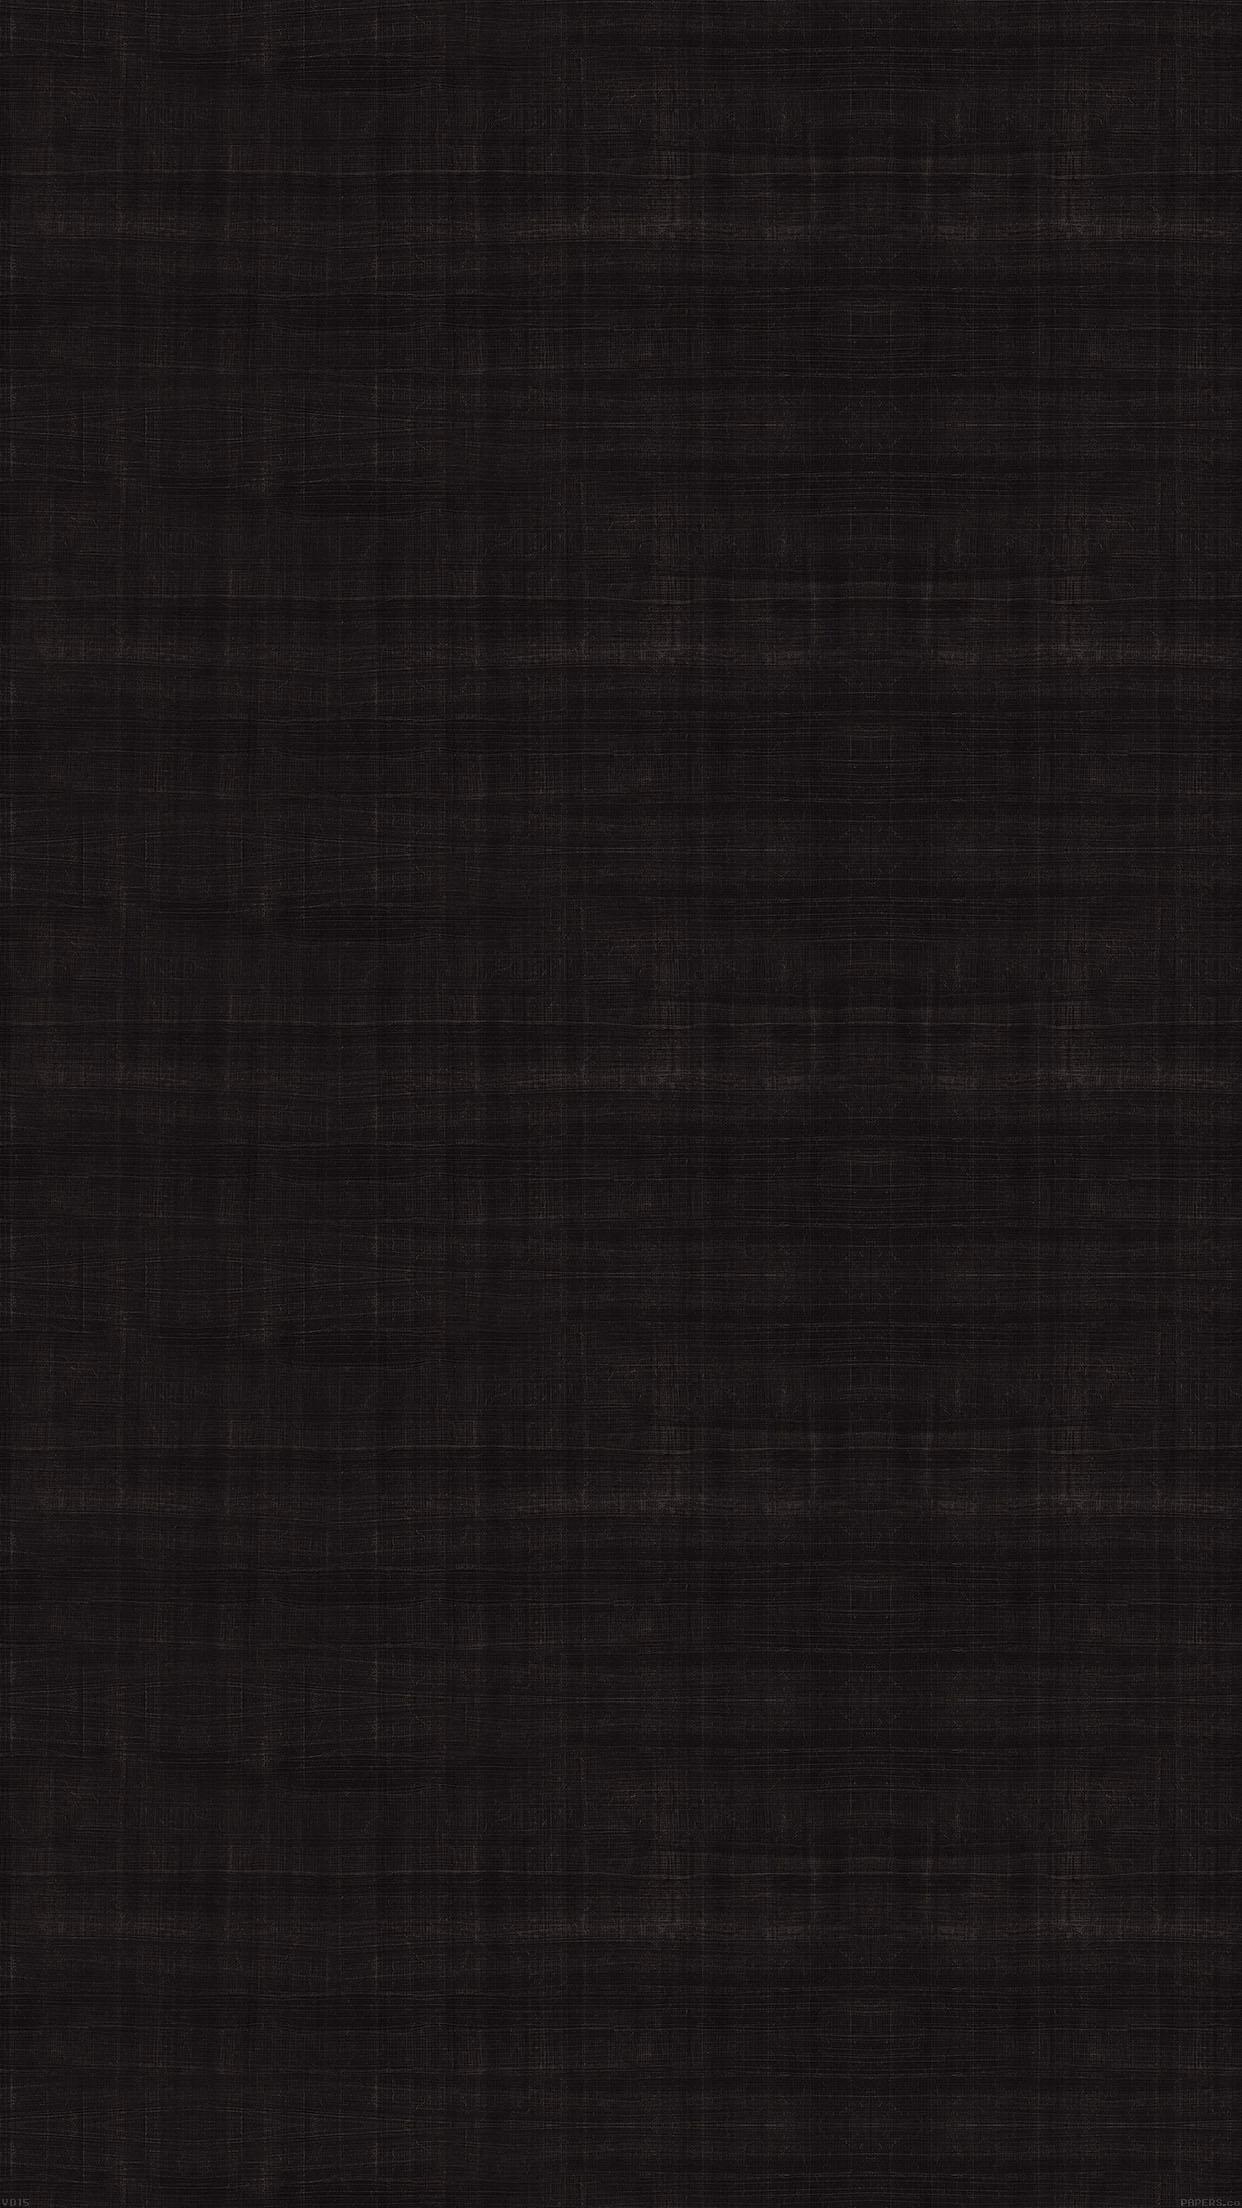 Vd15 Dark Wood Pattern Papers Co